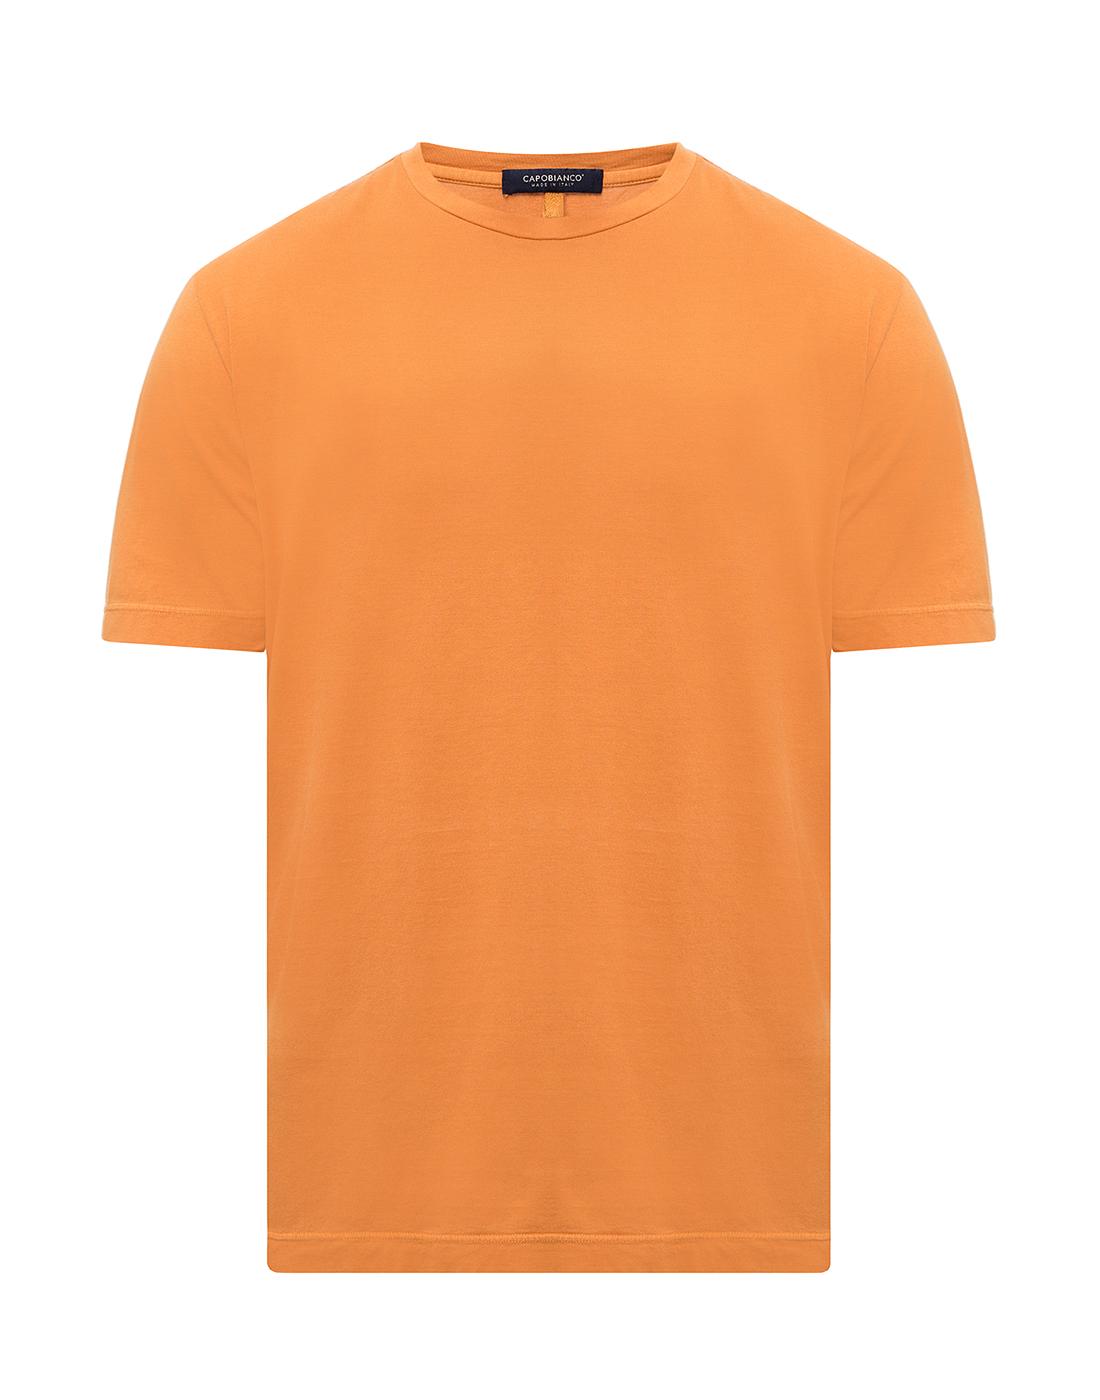 Мужская оранжевая футболка Capobianco S4M660.AL01 ARANCIONE-1